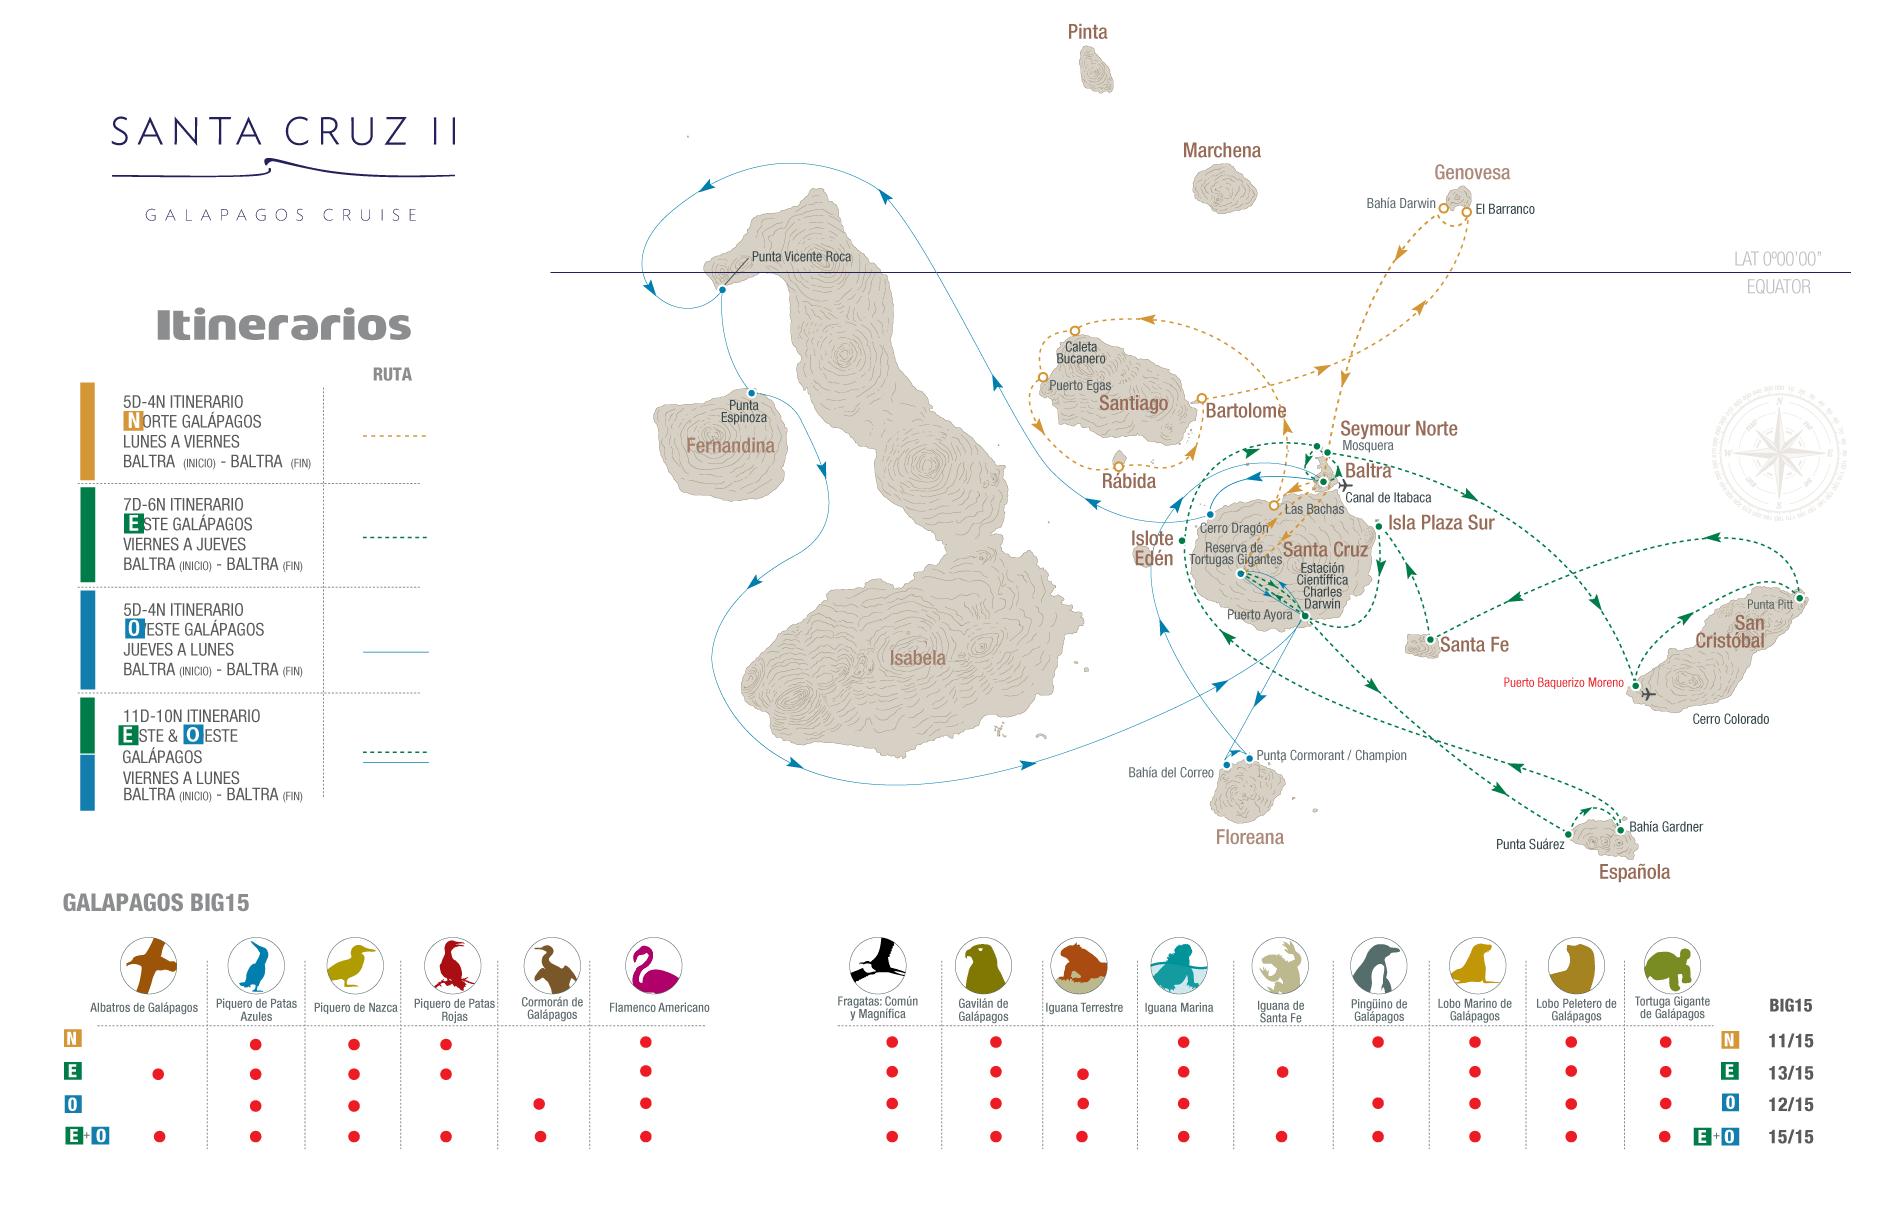 Galapagos Itineraries & Iconic Species aboard Santa Cruz Galapagos Cruise